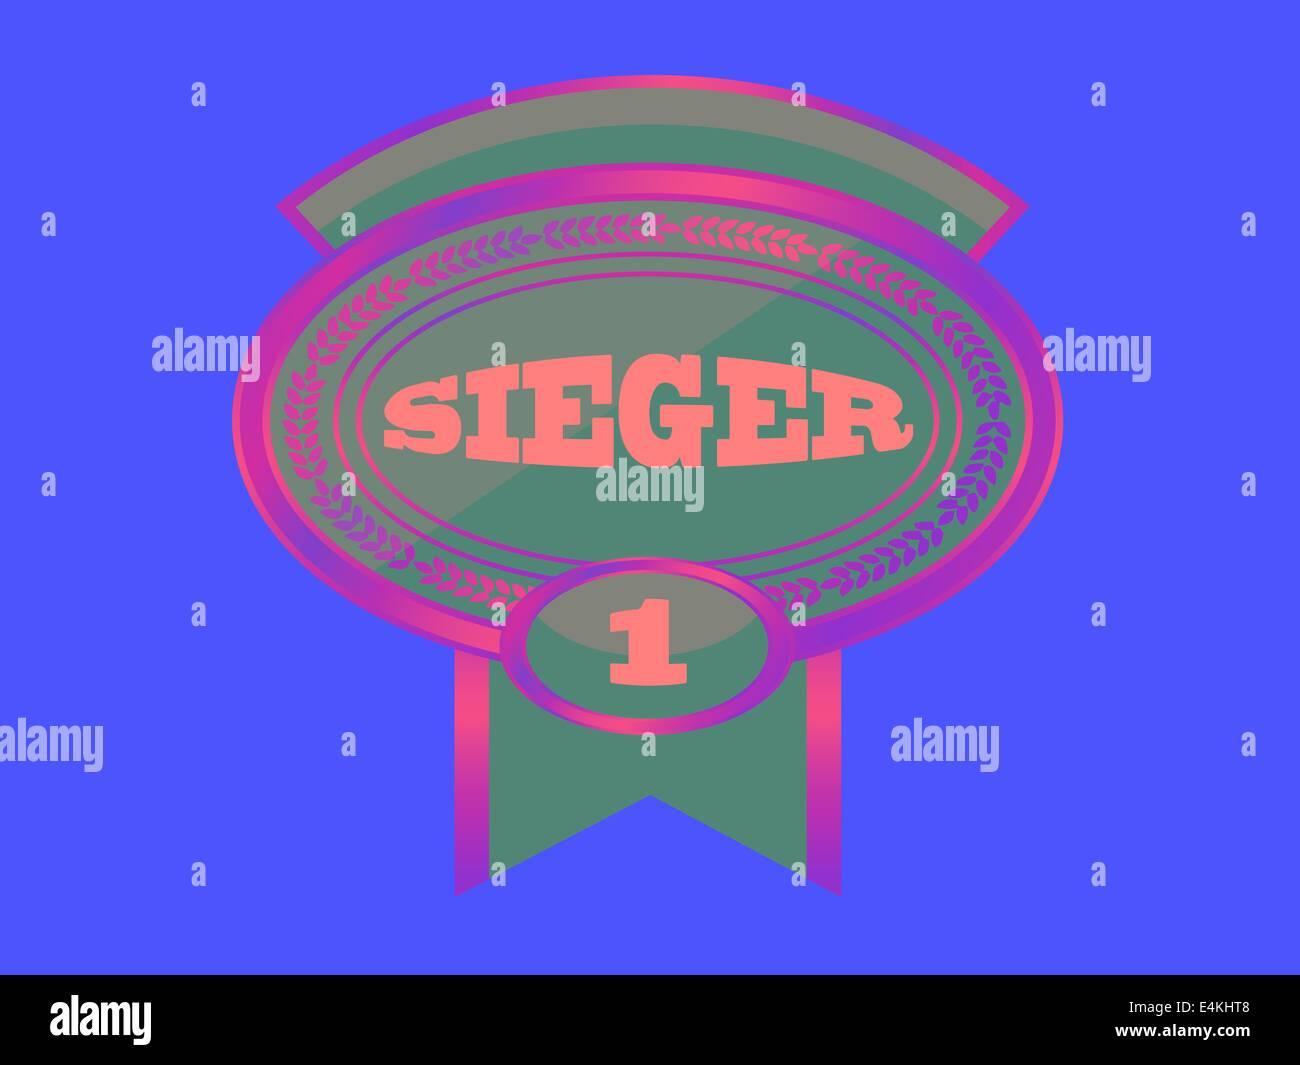 MEDAL - SIEGER - Stock Image